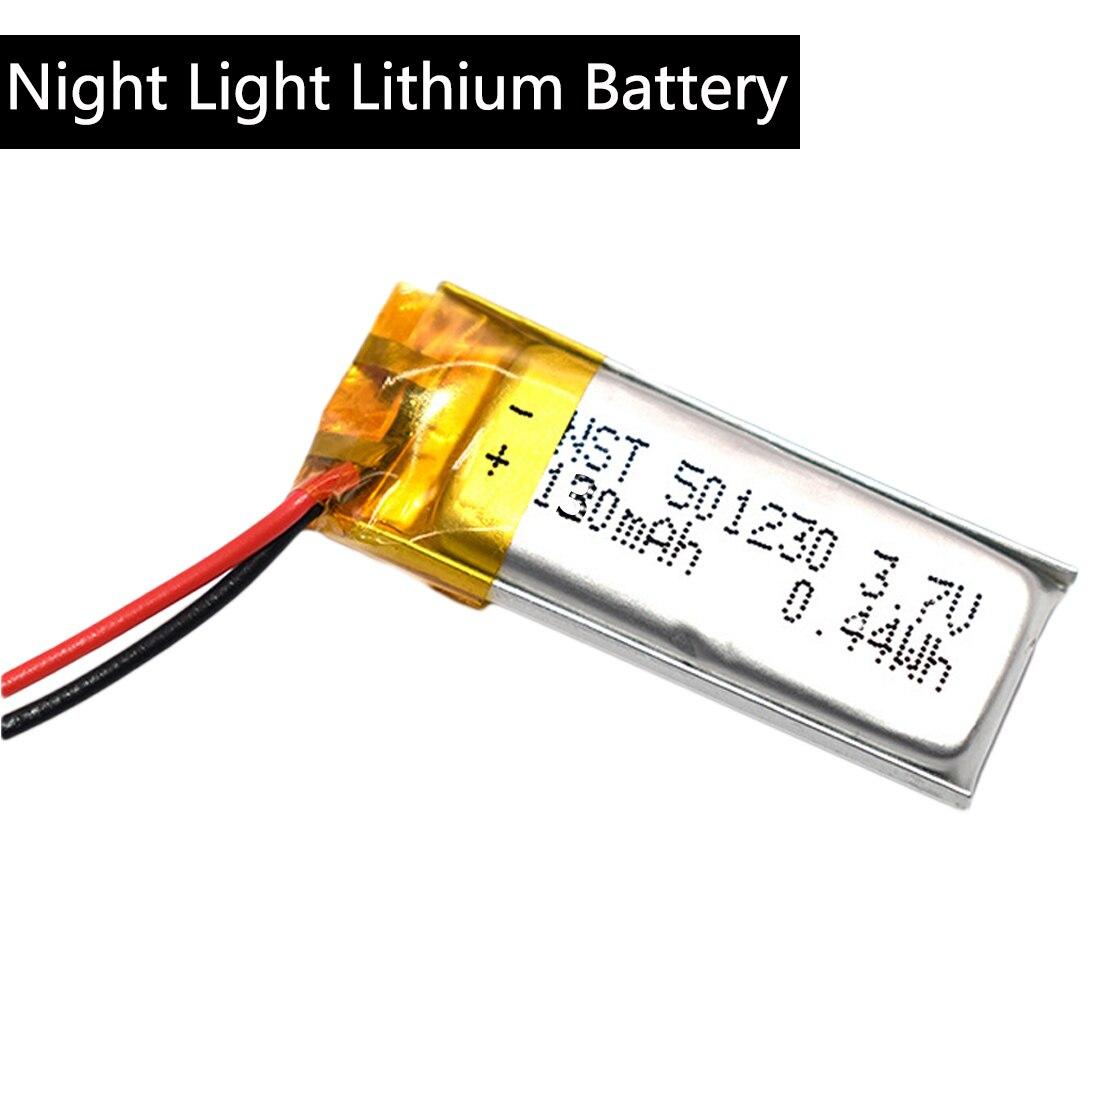 3,7 V 130 Mah 501230 Lithium-polymer Lipo Li Ionen Akku Lipo Zellen Für Mobile Bluetooth Kopfhörer Lautsprecher Mp3 Mp4 Neue 100% Original